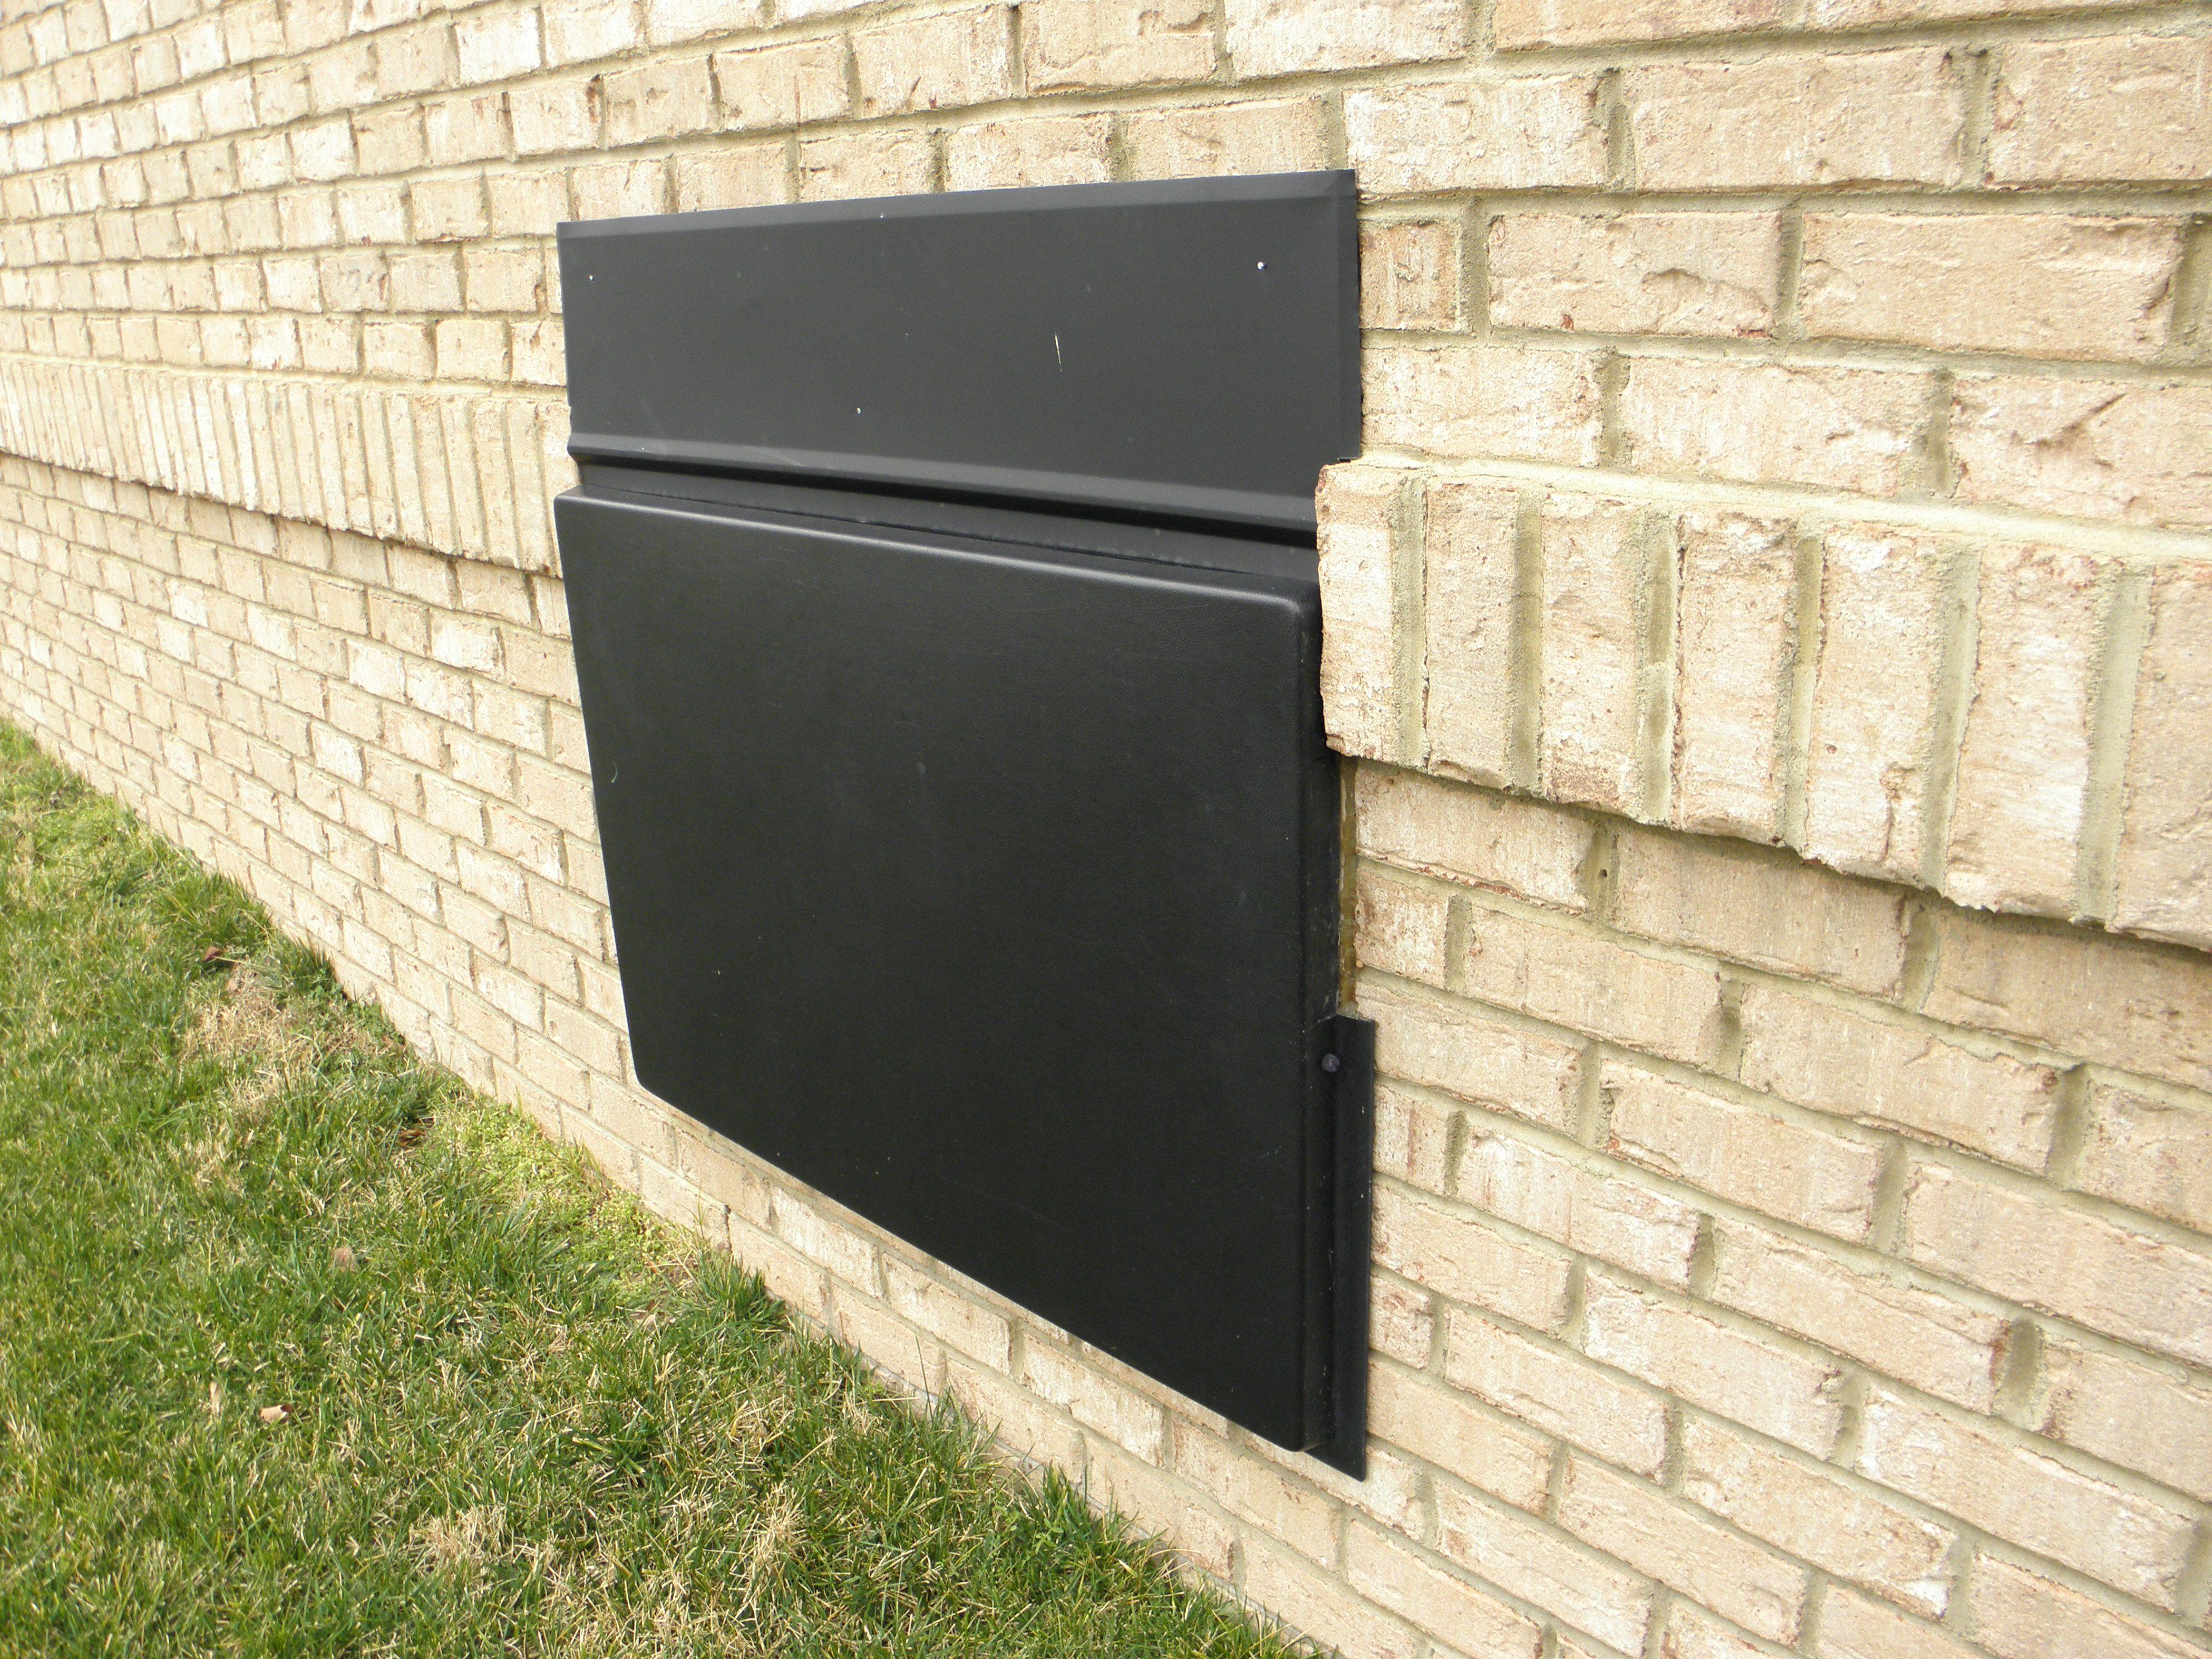 Modified 24x36 Crawl Space Door In Virginia Crawl Space Door Crawlspace Doors